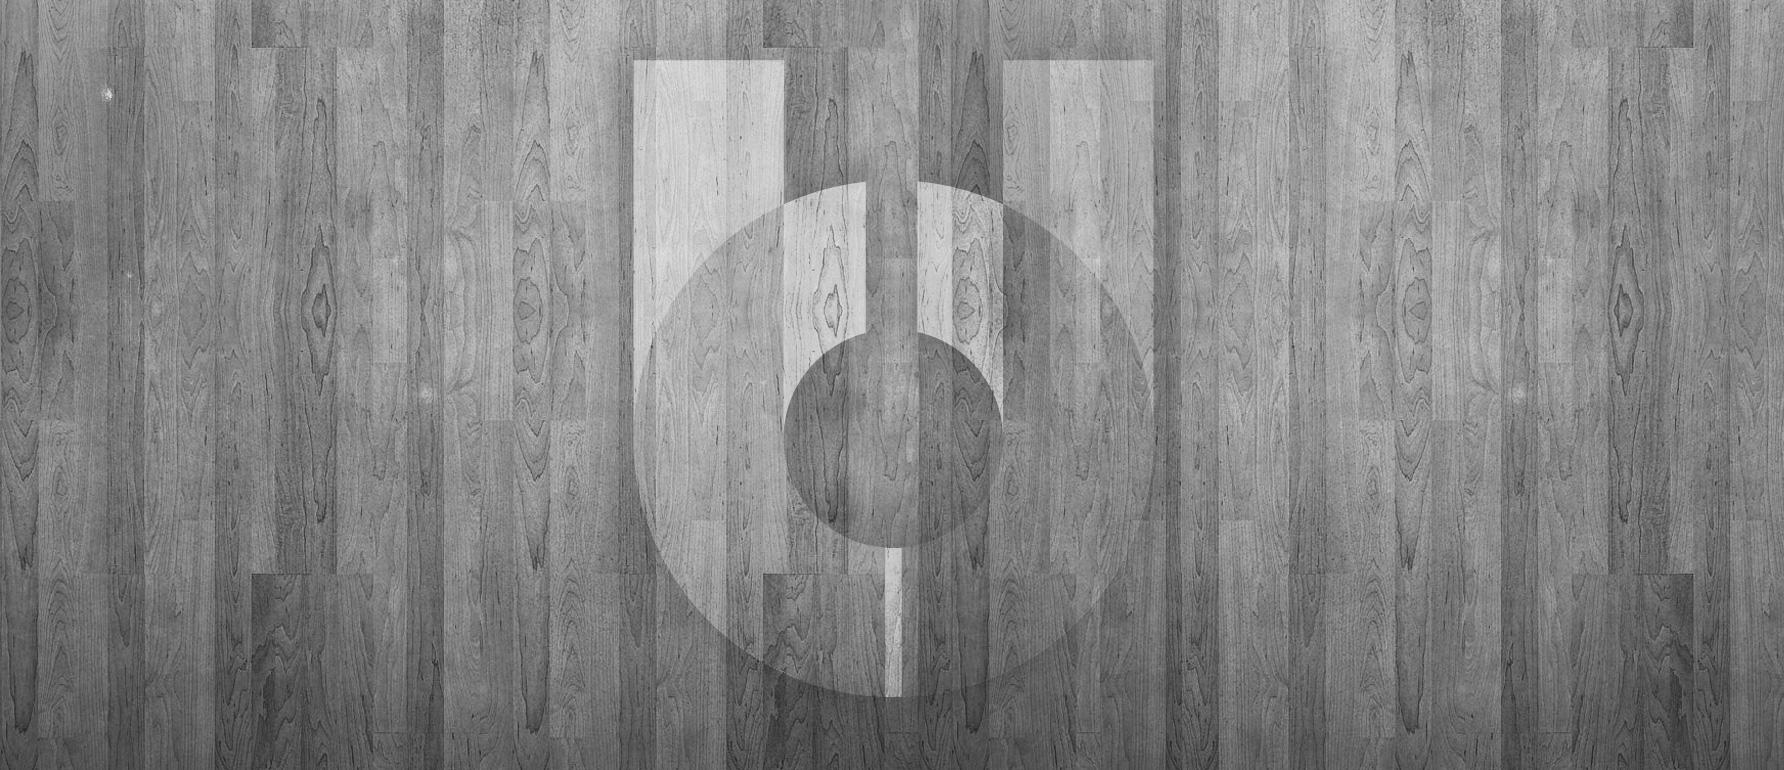 Conceptual logo graphic